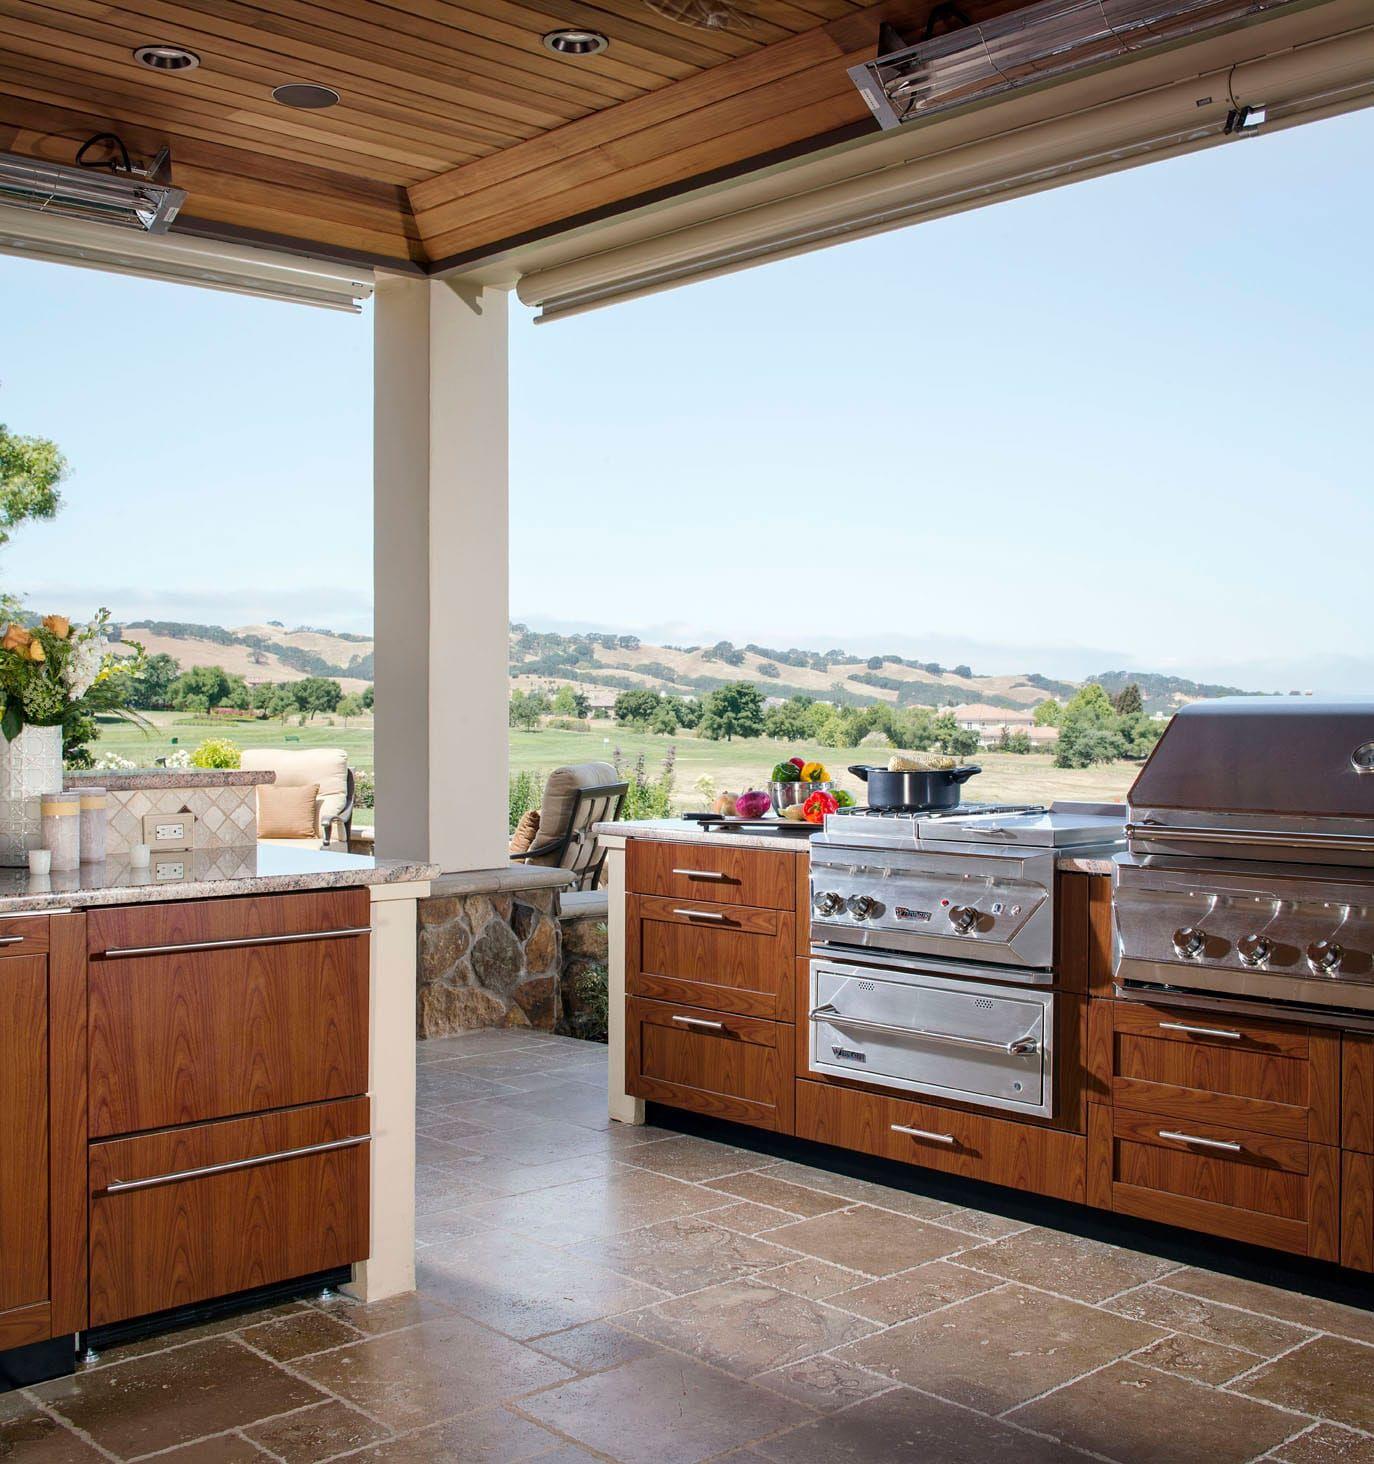 Danver Stainless Steel Outdoor Kitchens Luxury Outdoor Kitchen Outdoor Kitchen Design Luxury Kitchen Modern